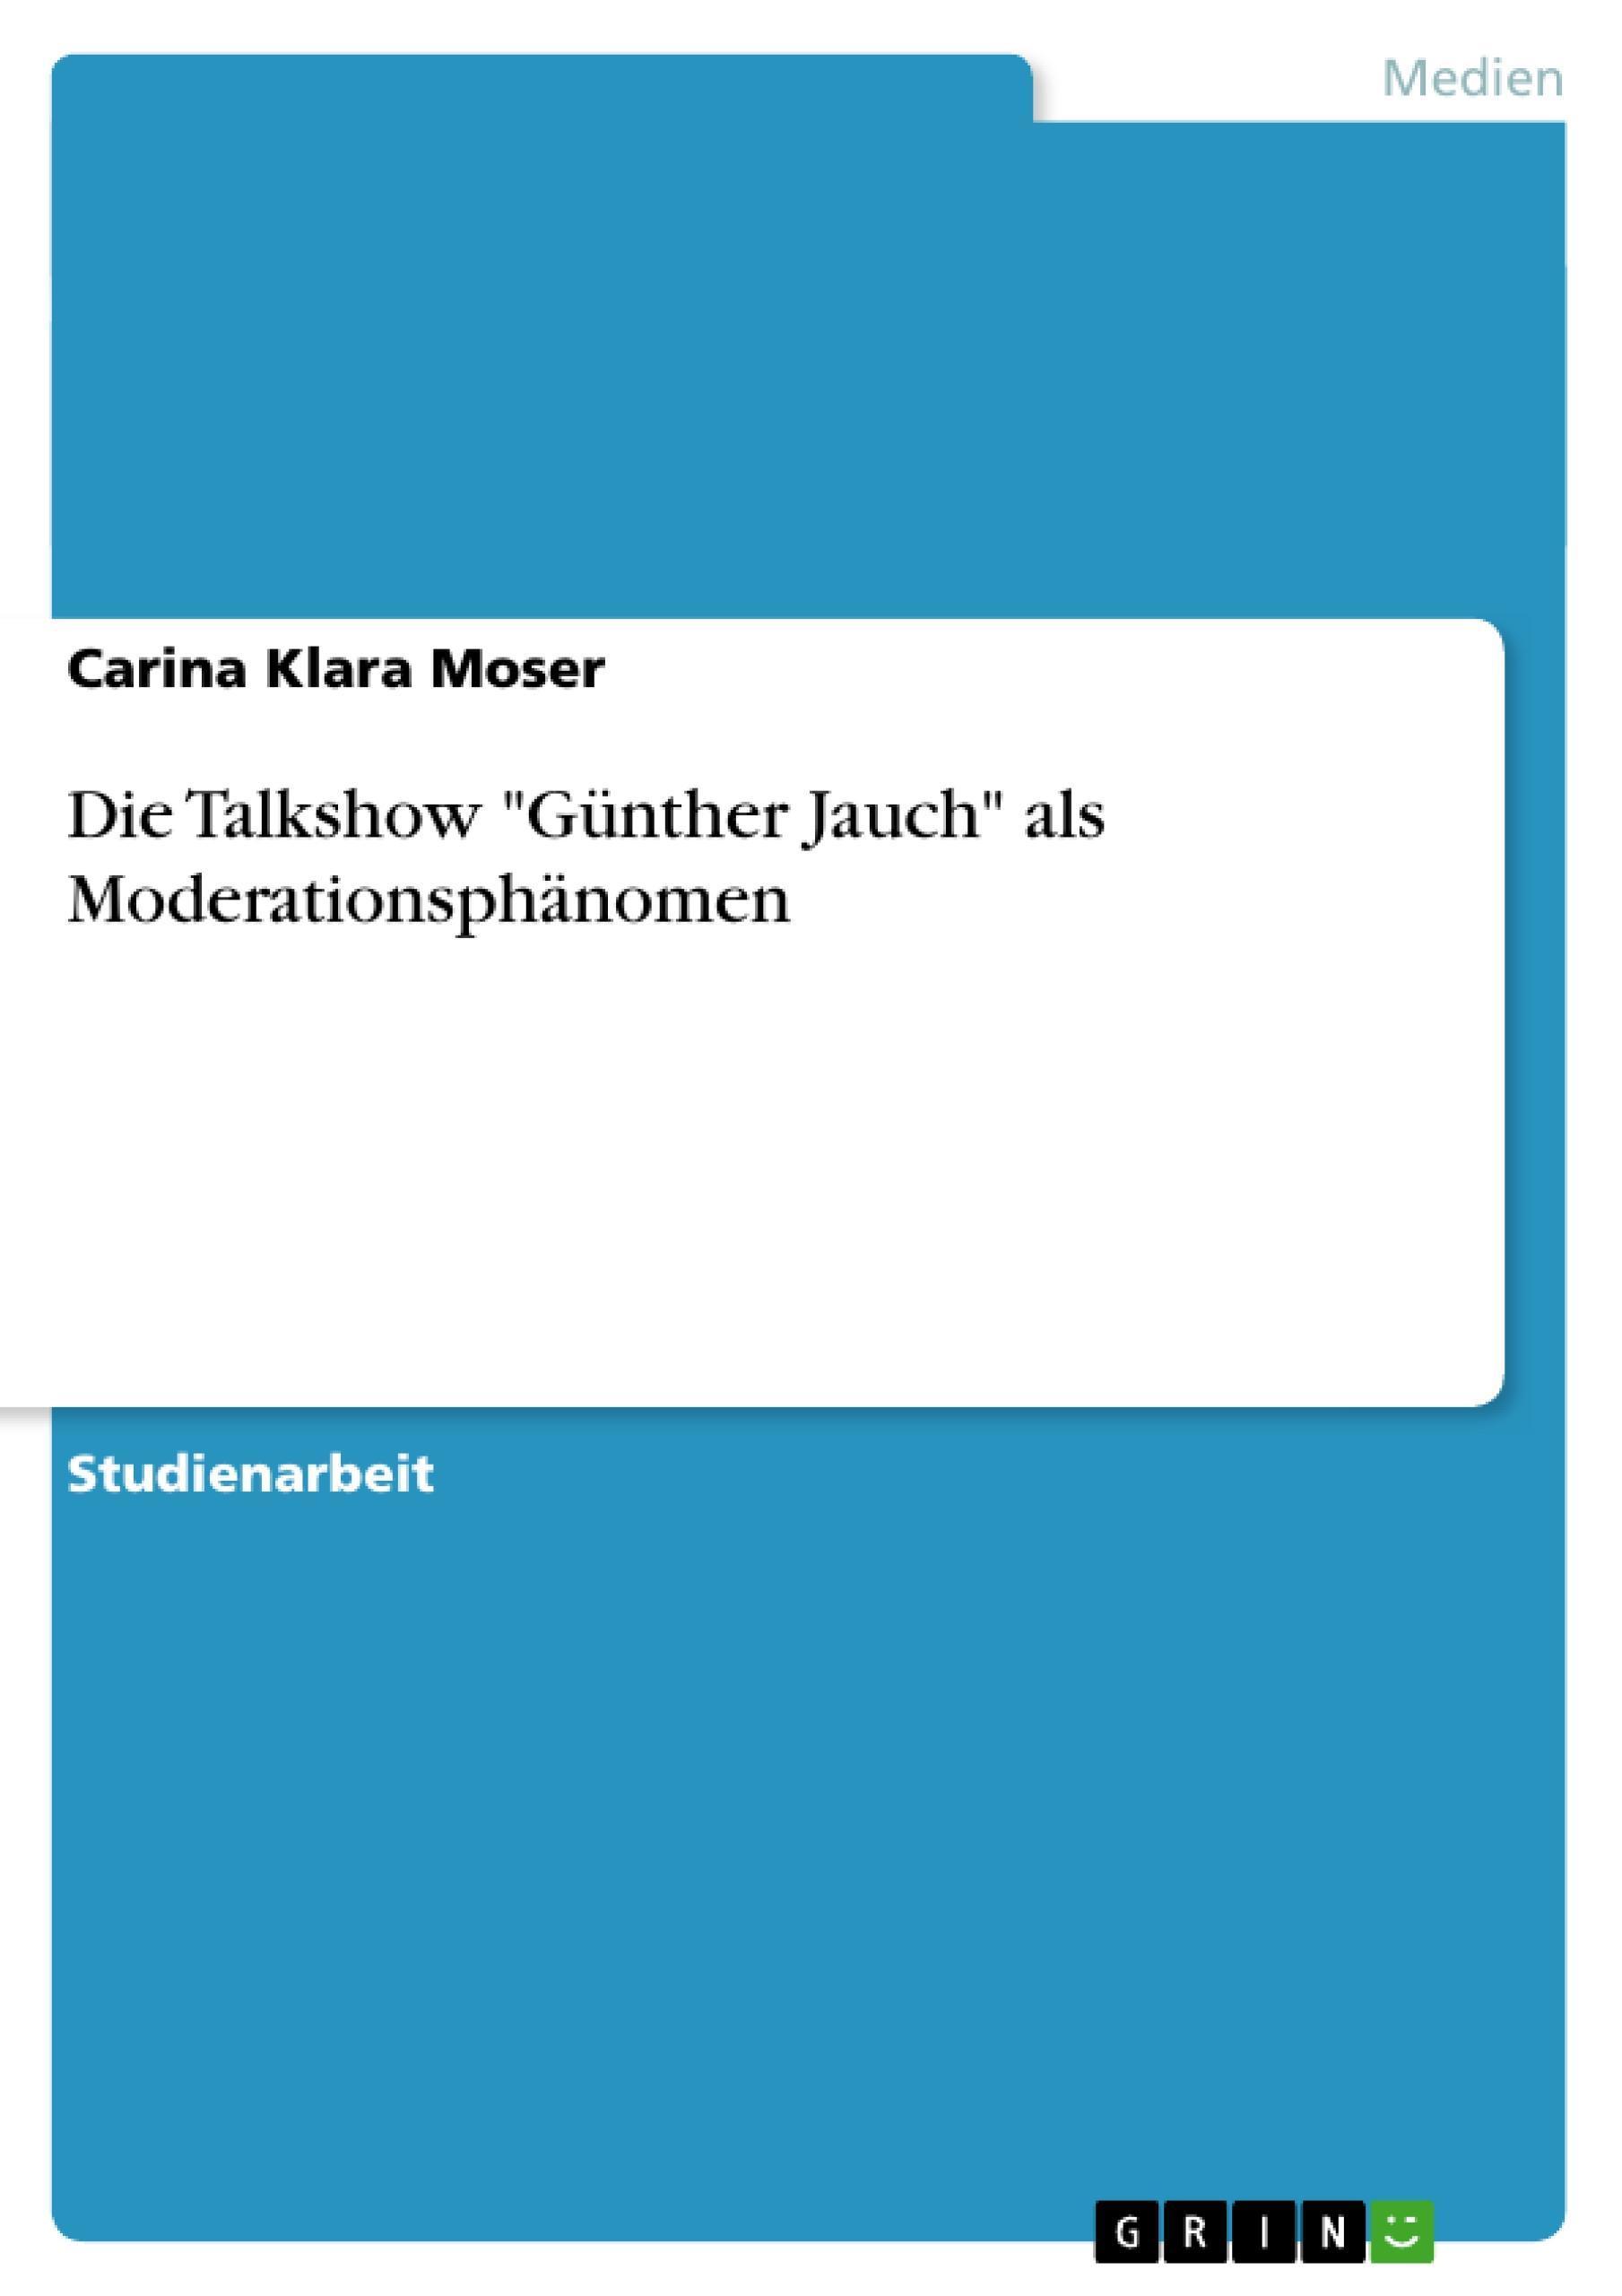 "Die Talkshow """"Günther Jauch"""" als Moderationsphänomen Carina Klara Moser"